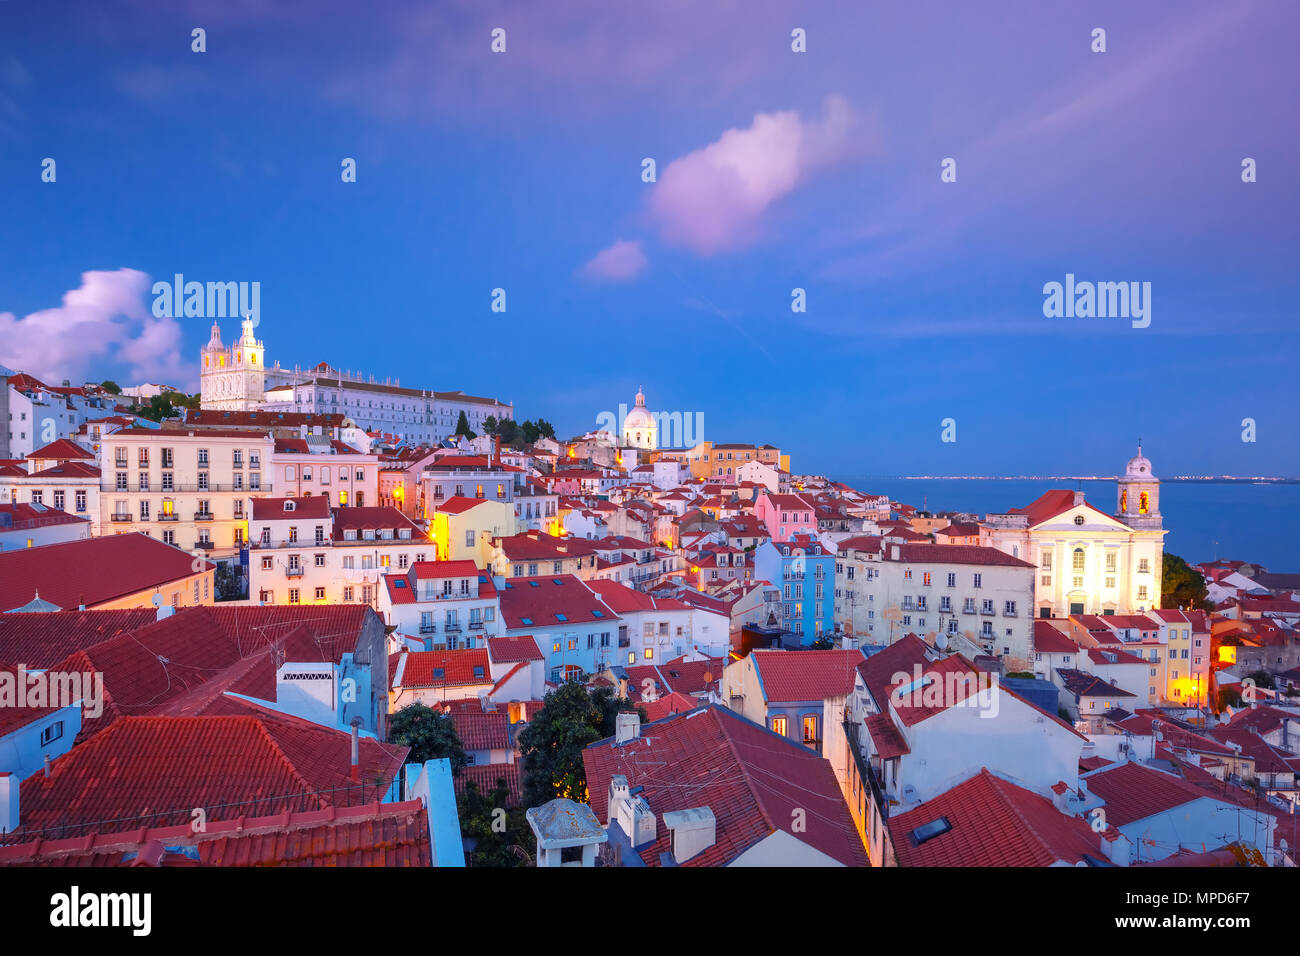 Alfama at night, Lisbon, Portugal - Stock Image